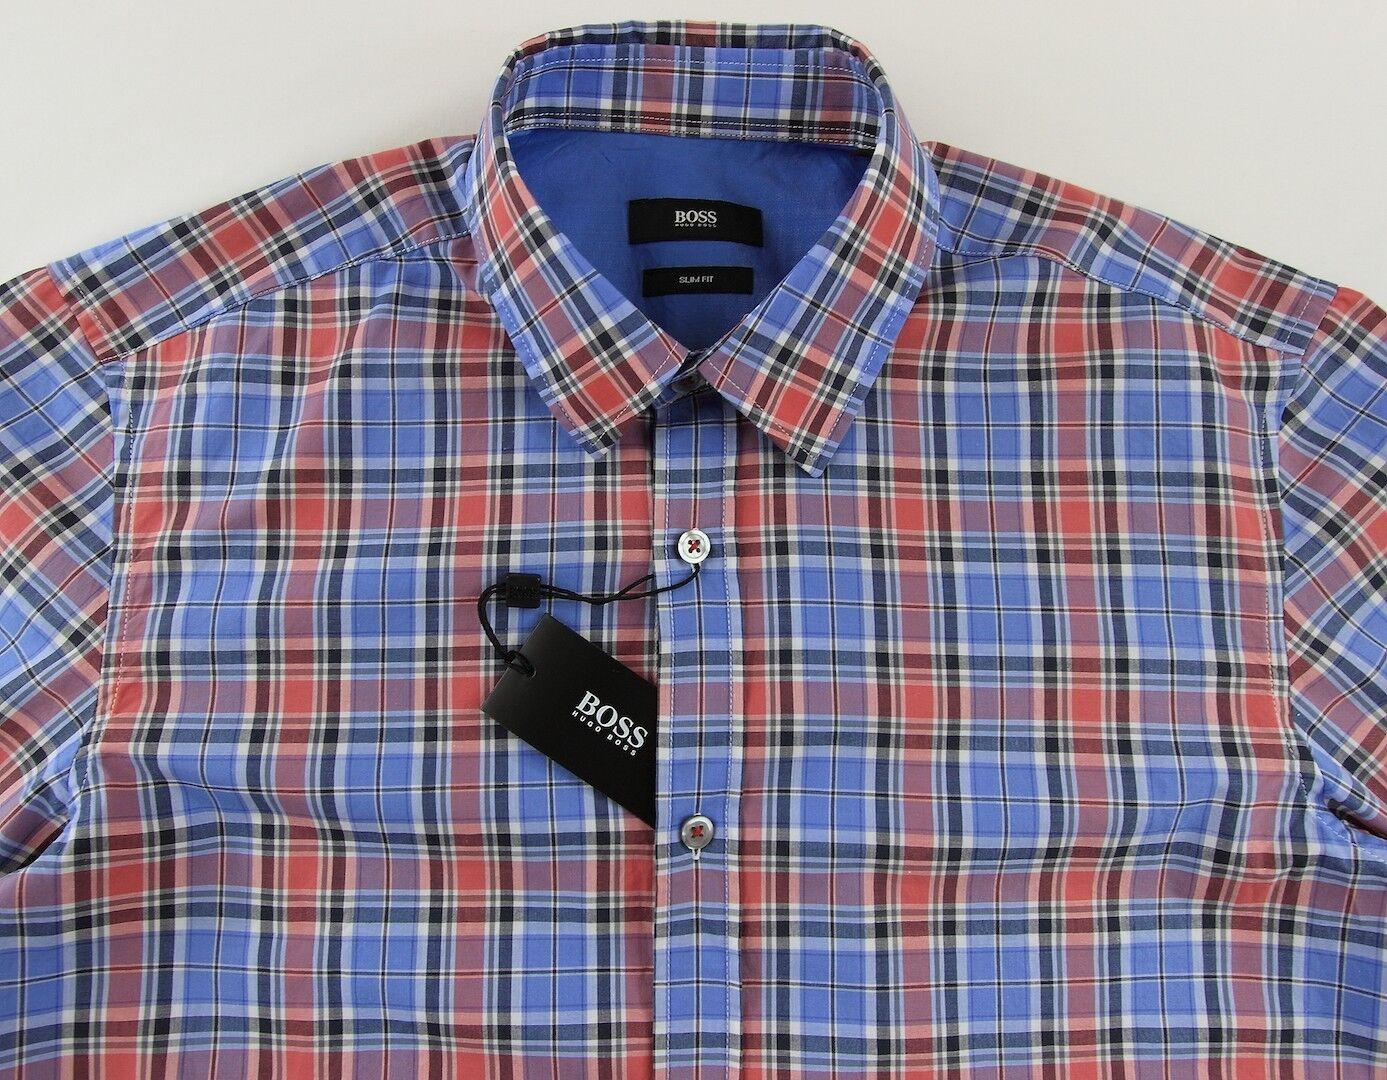 Men's HUGO BOSS bluee Red Plaid RONNY Shirt Extra Large XL NWT NEW + Slim Fit